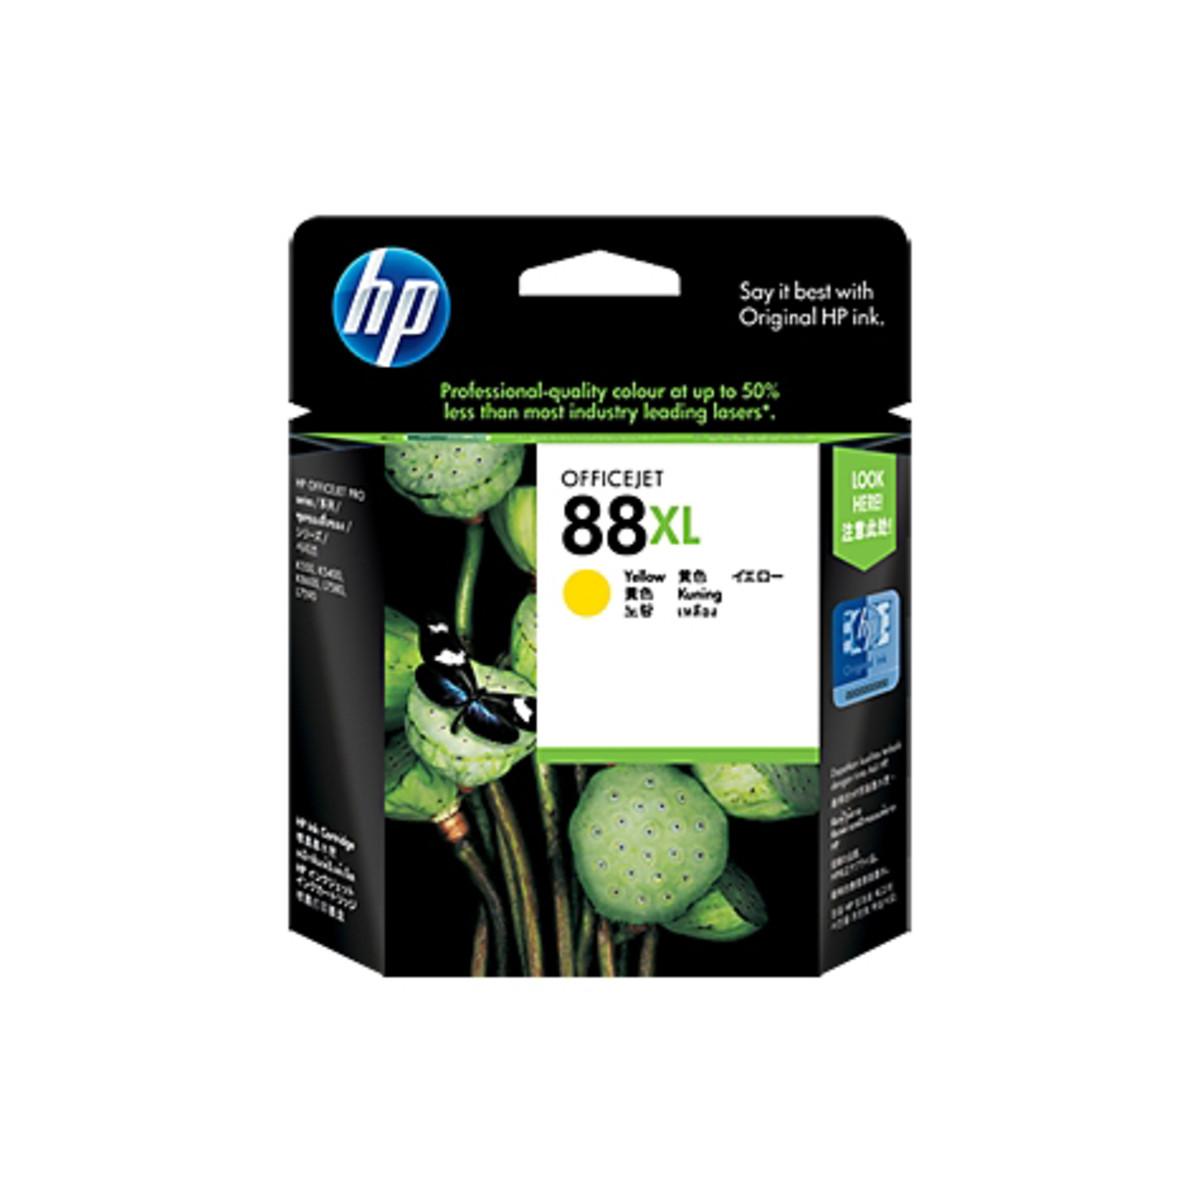 HP 88XL (C9393A) Yellow Ink Cartridge - High Yield